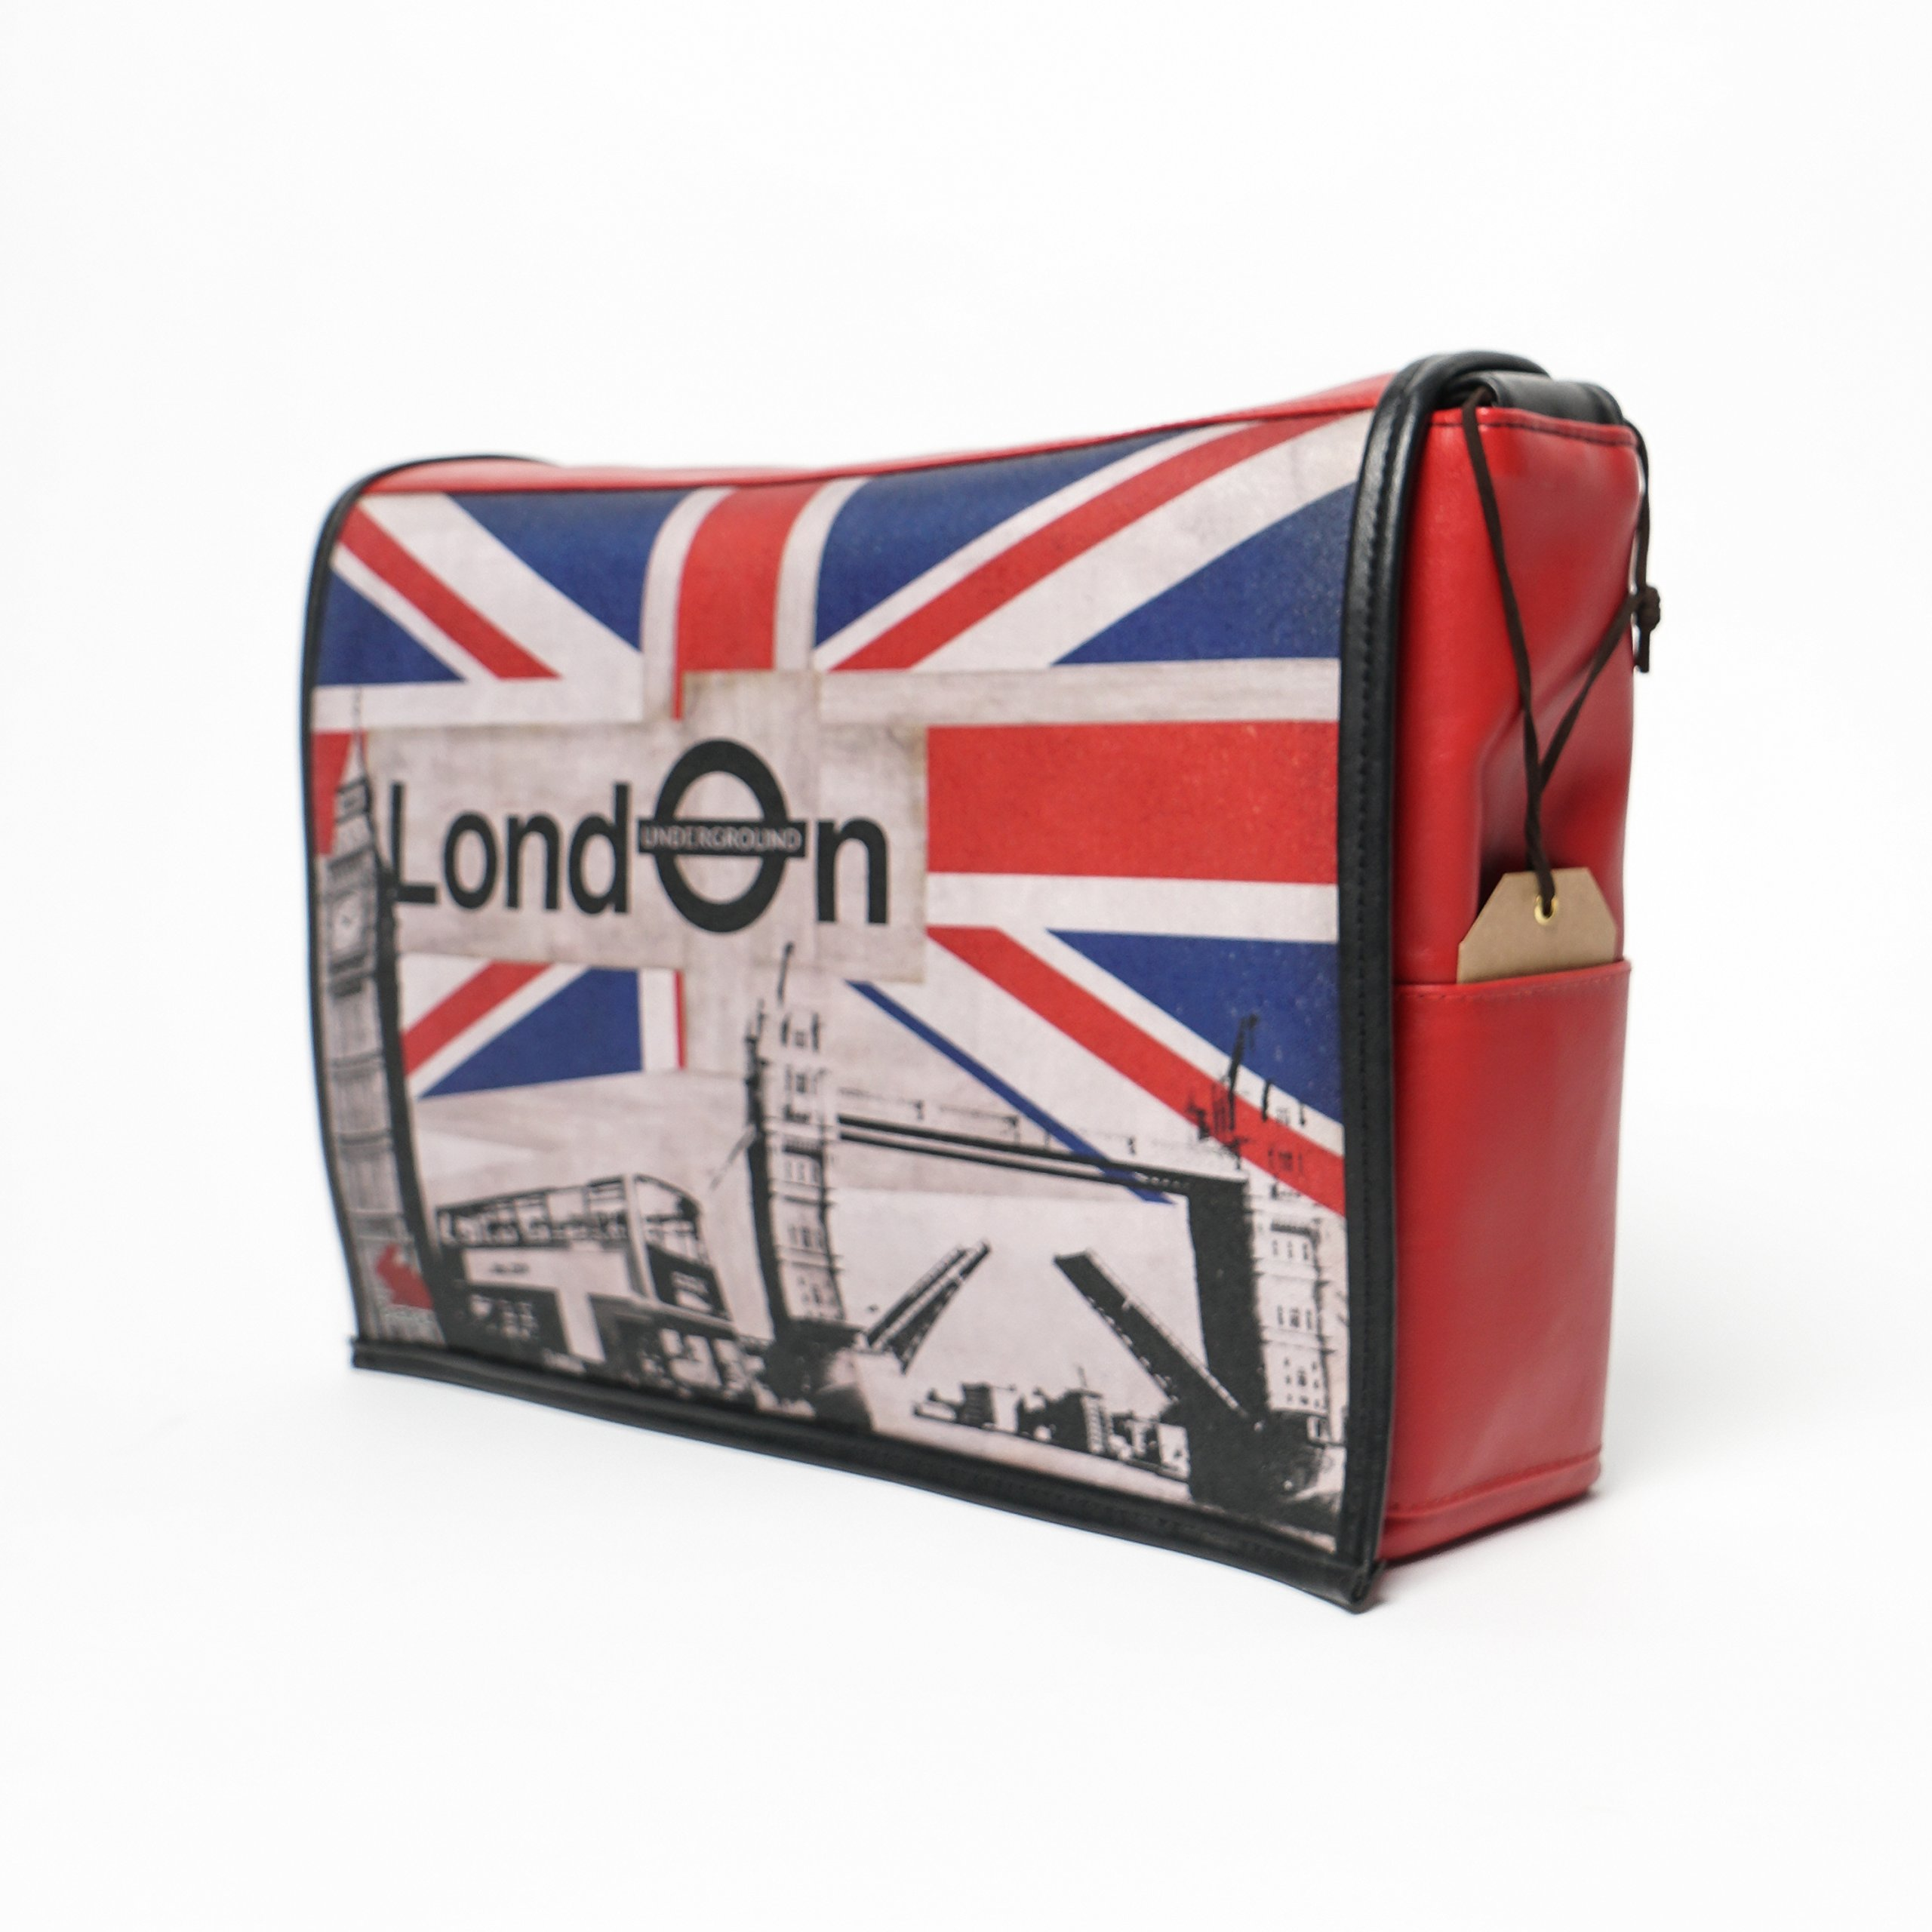 Student - London Print - Benga Rabbit - Red Vegan Leather Messenger Bag